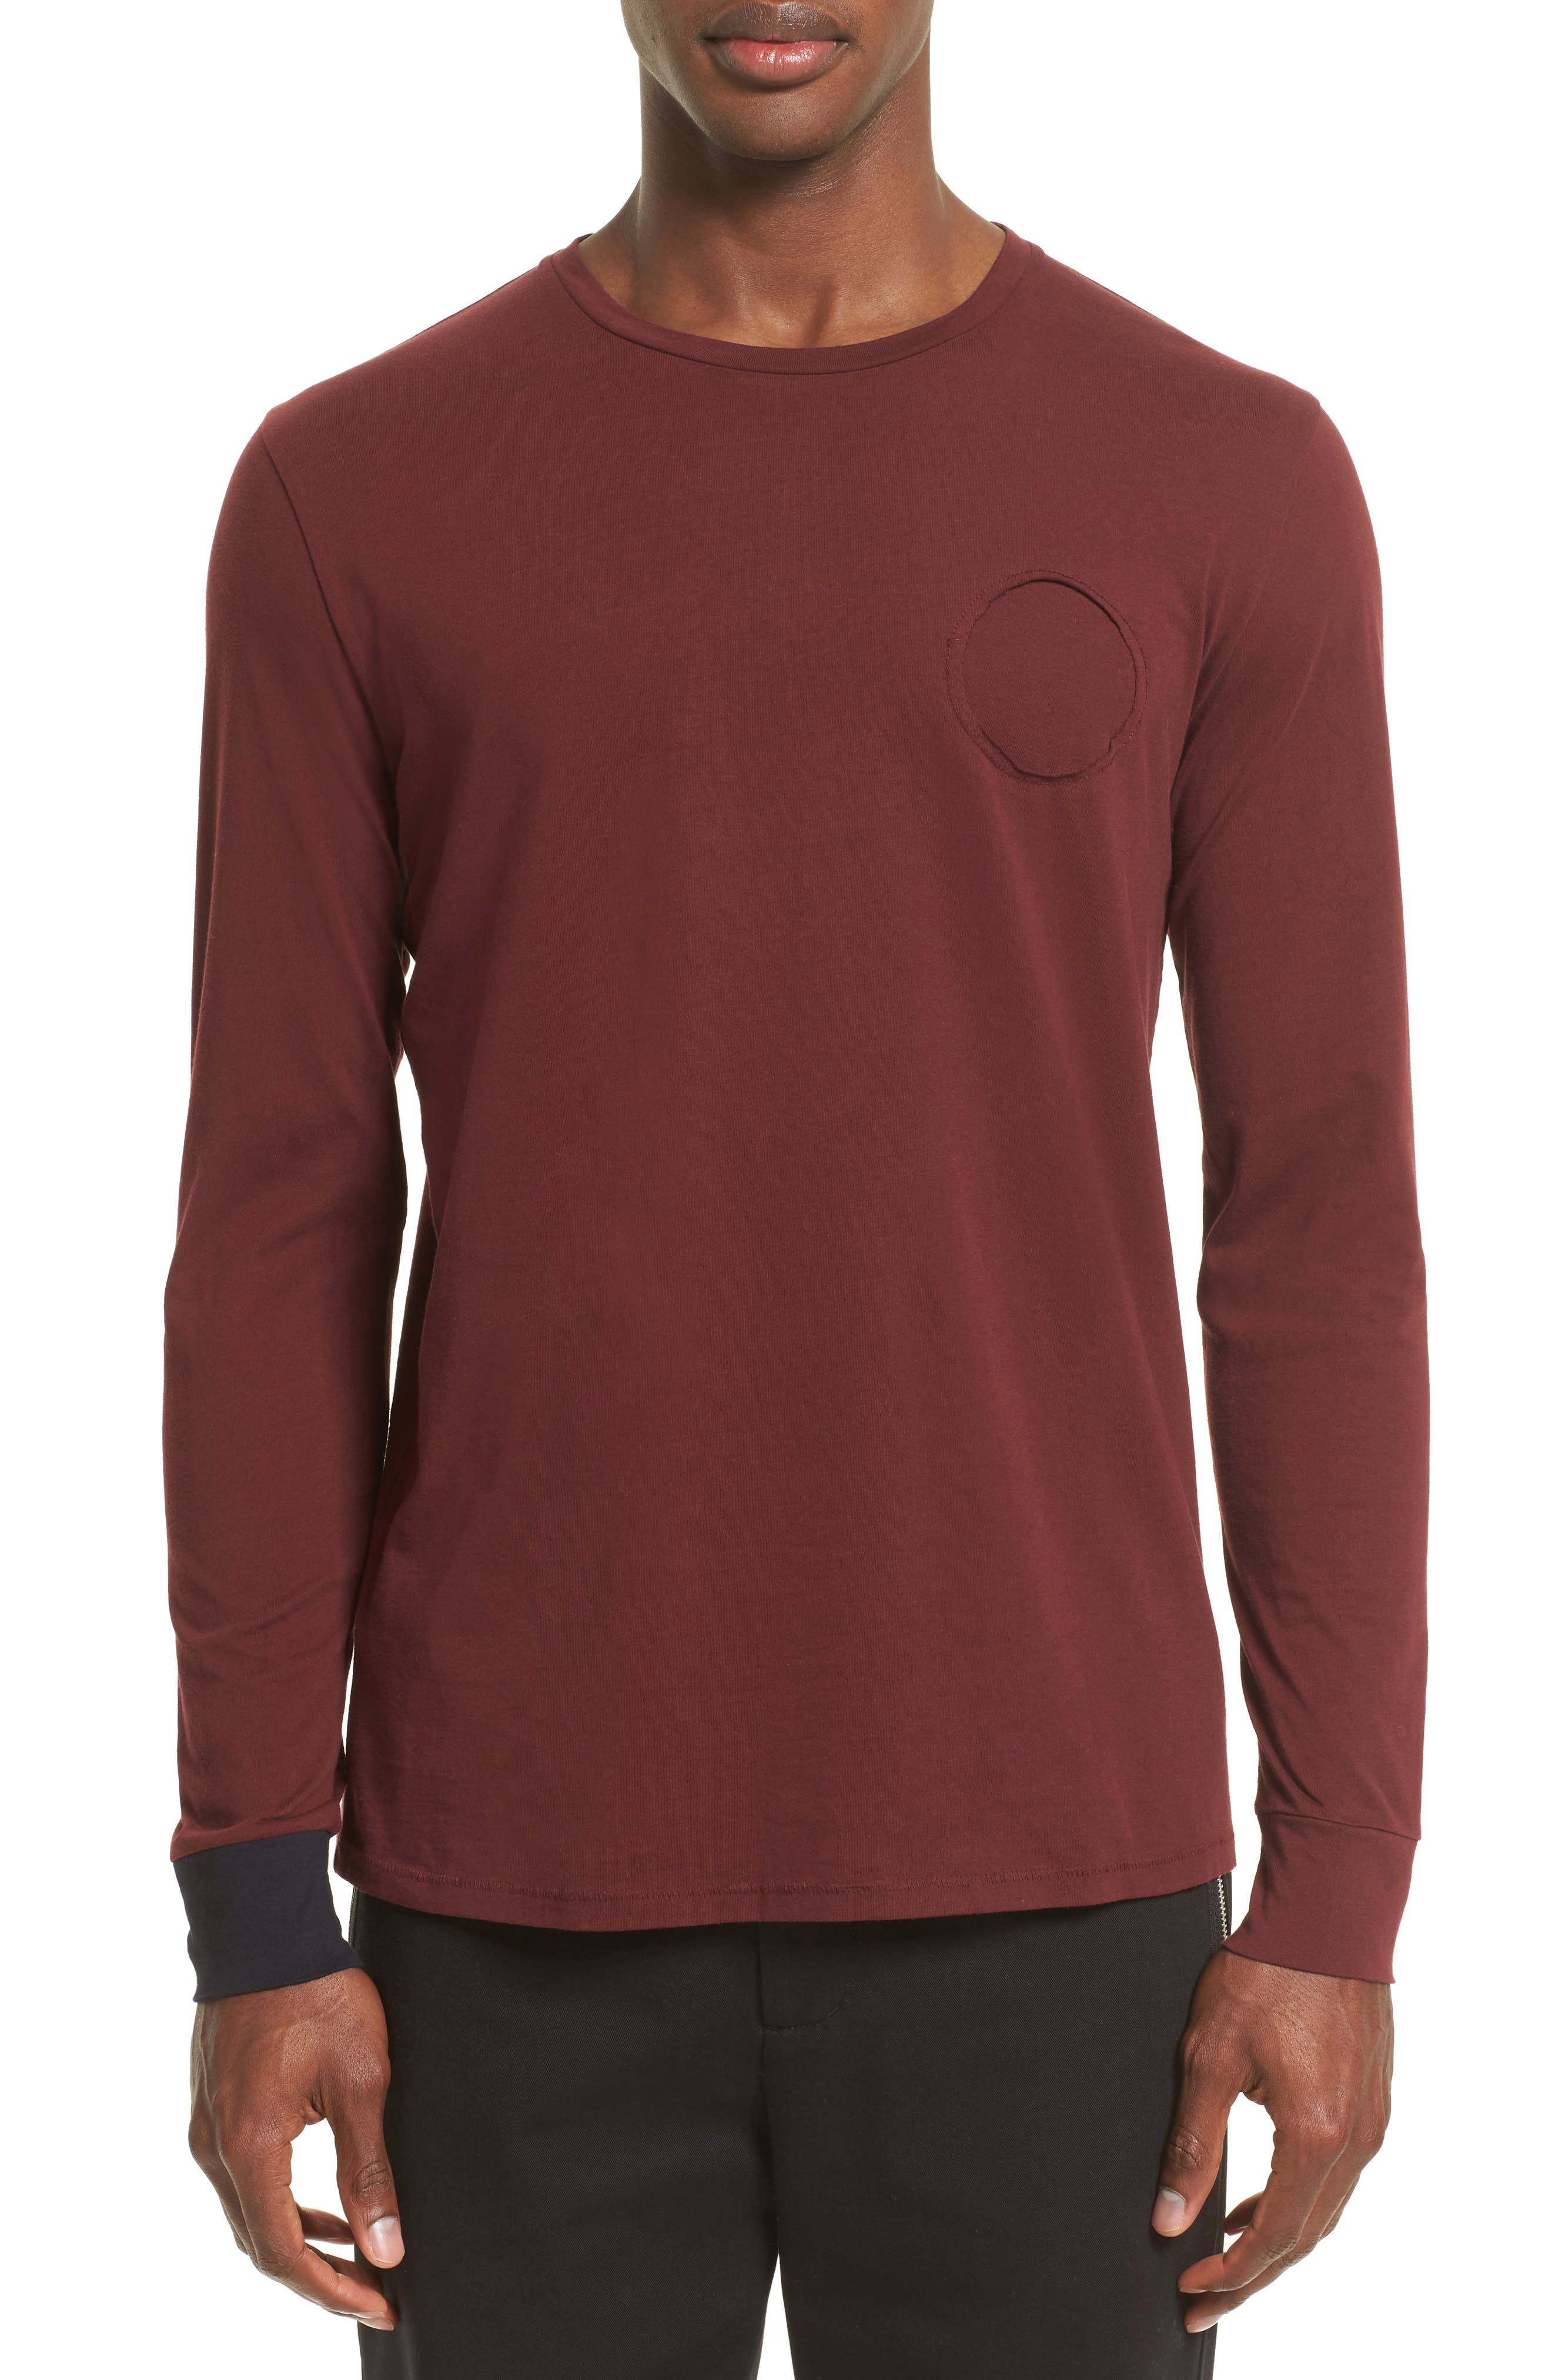 Main Image - 3.1 Phillip Lim Contrast Cuff T-Shirt